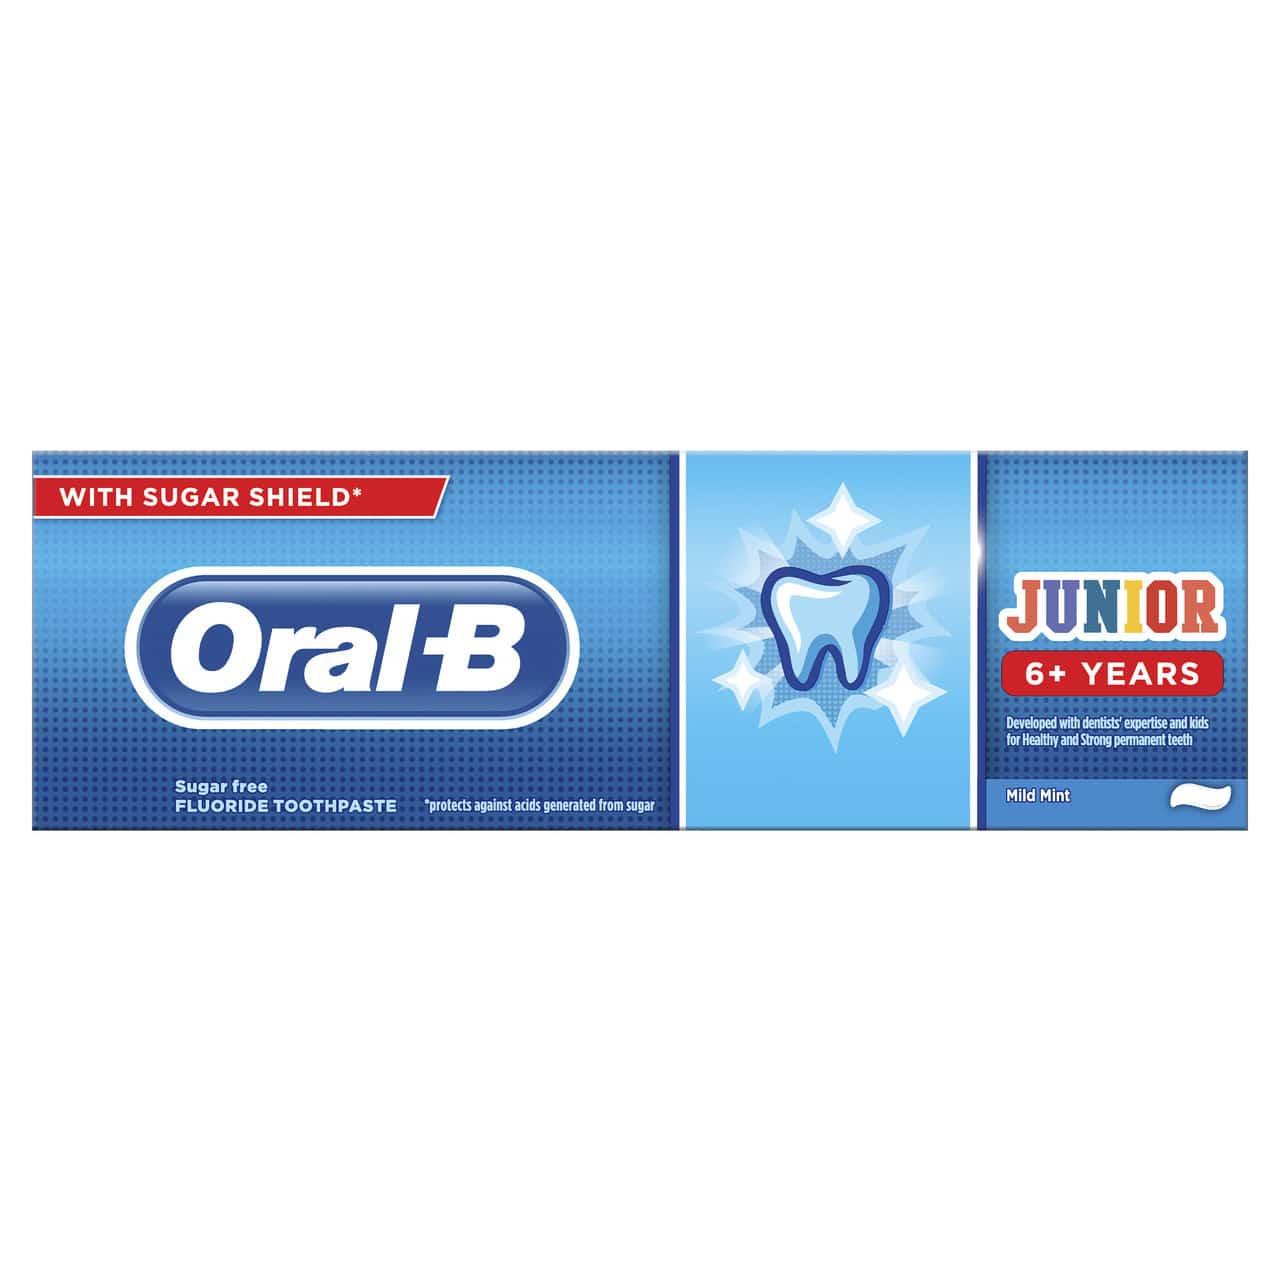 ORAL B TOOTHPASTE JUNIOR 6+YRS 75ML (NEW)